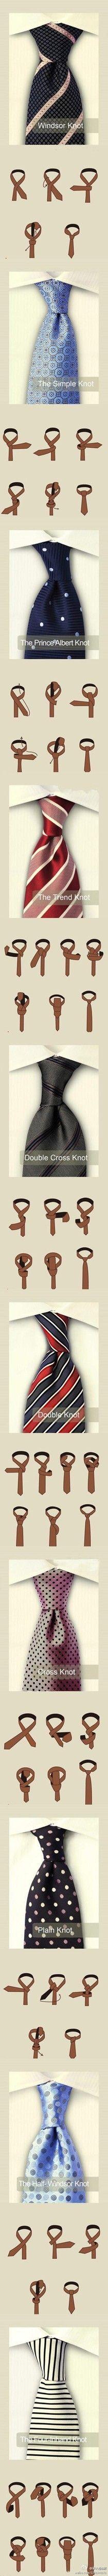 Tie instructions!